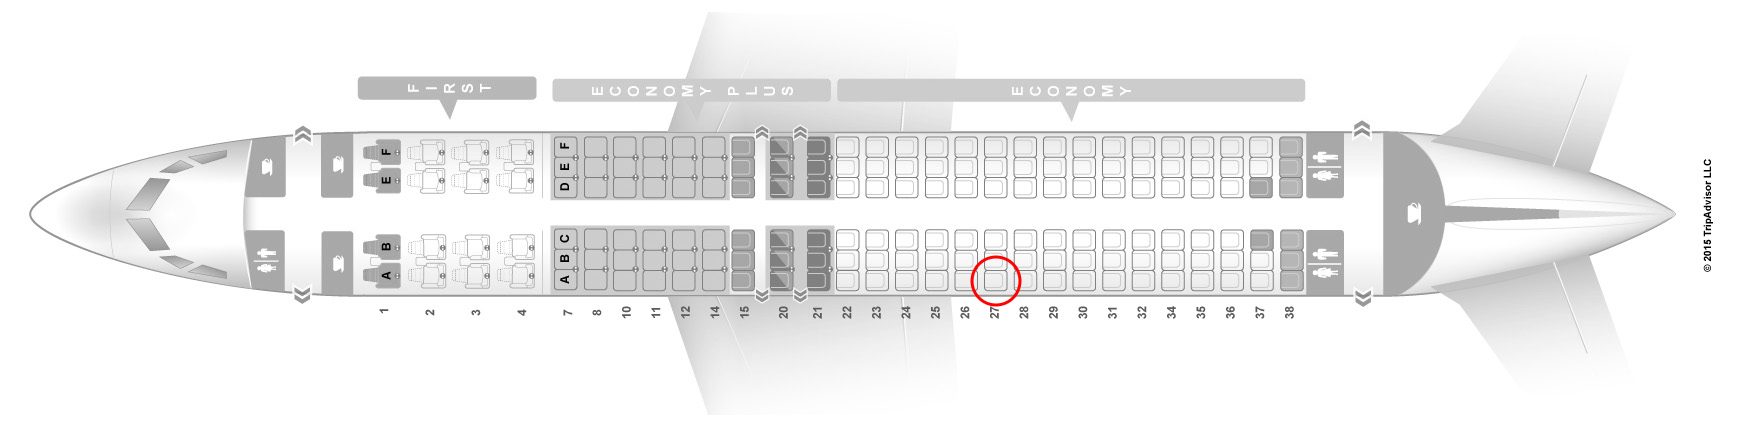 united 737-800 seat map